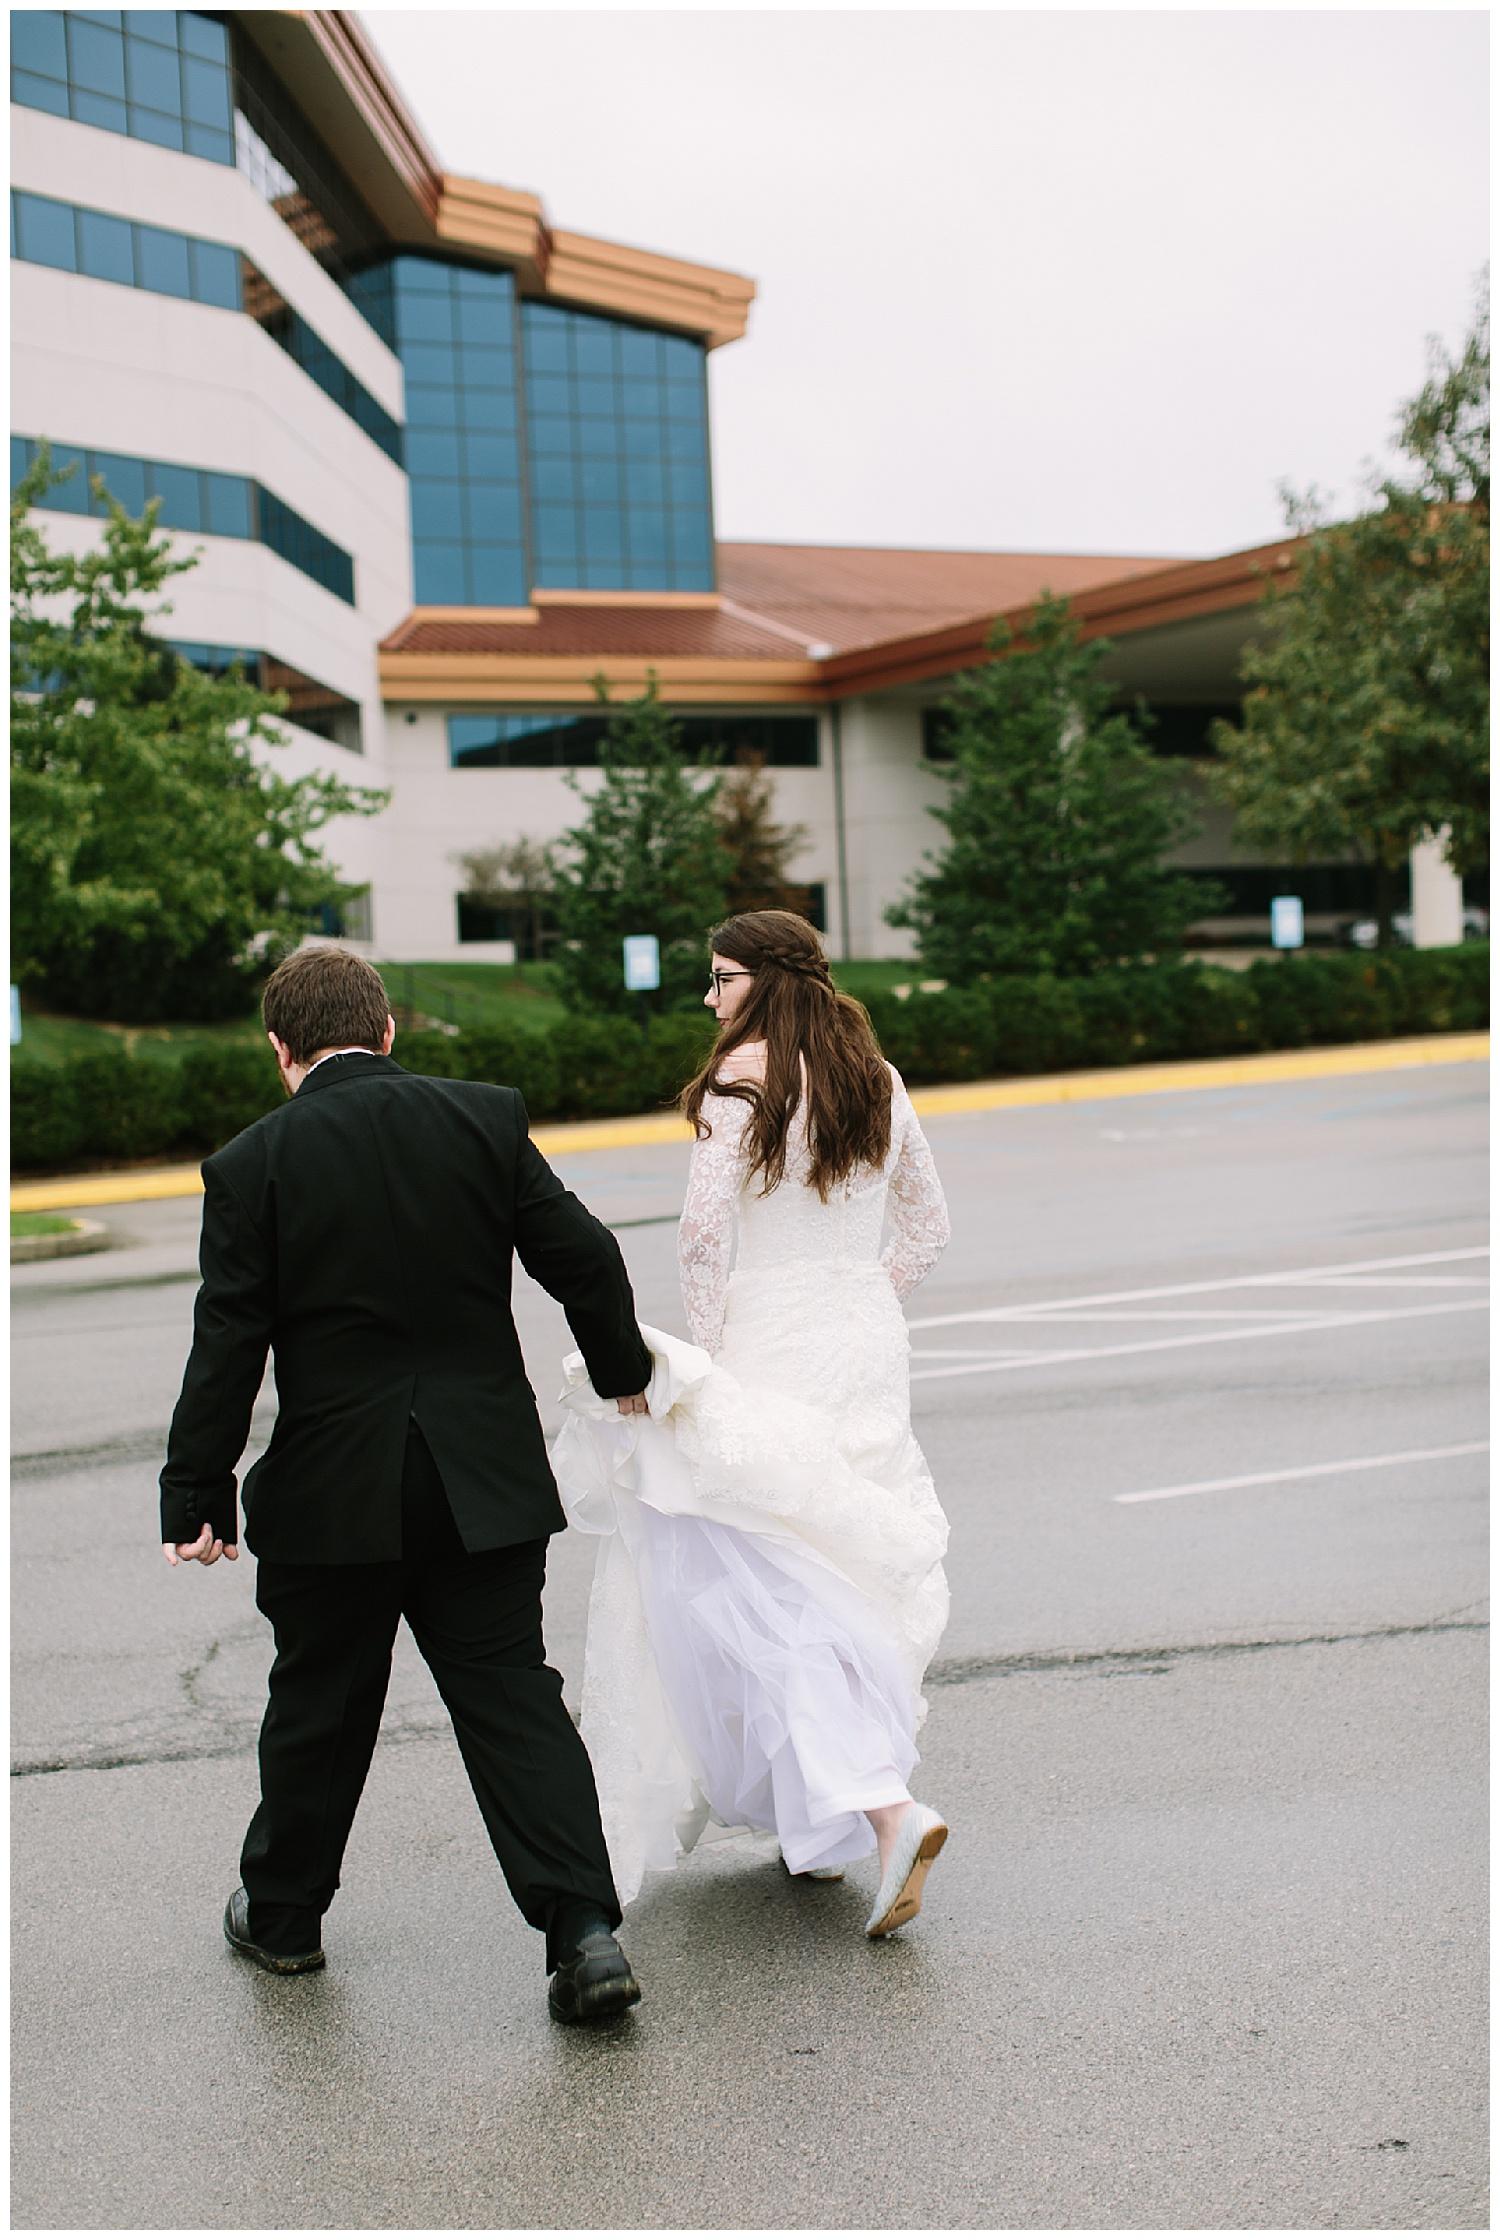 trent.and.kendra.photography.captains.quarters.princess.cruise.wedding-30.jpg